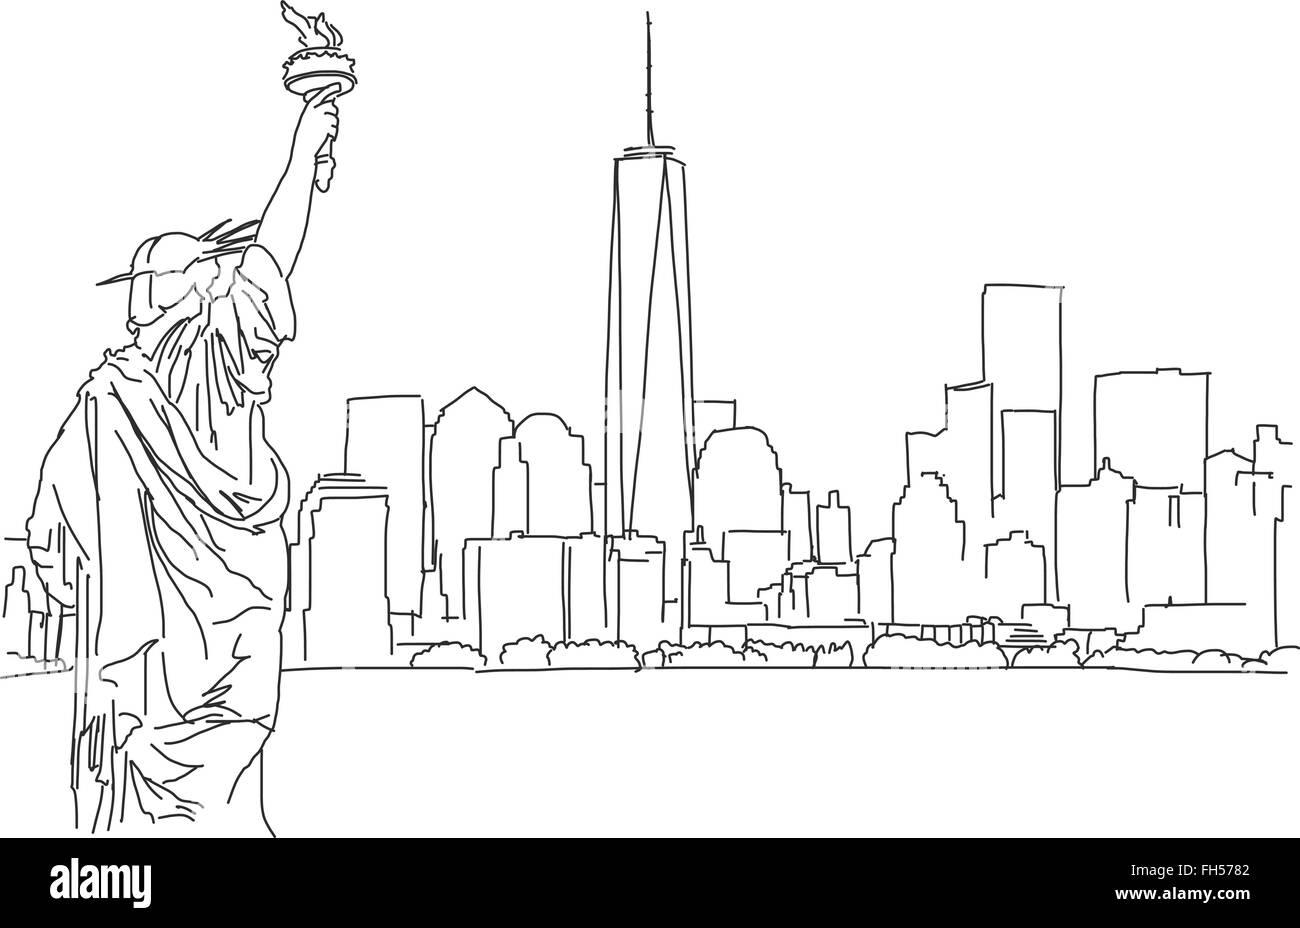 Free Hand Sketch Of New York City Skyline Vector Outline Scribble